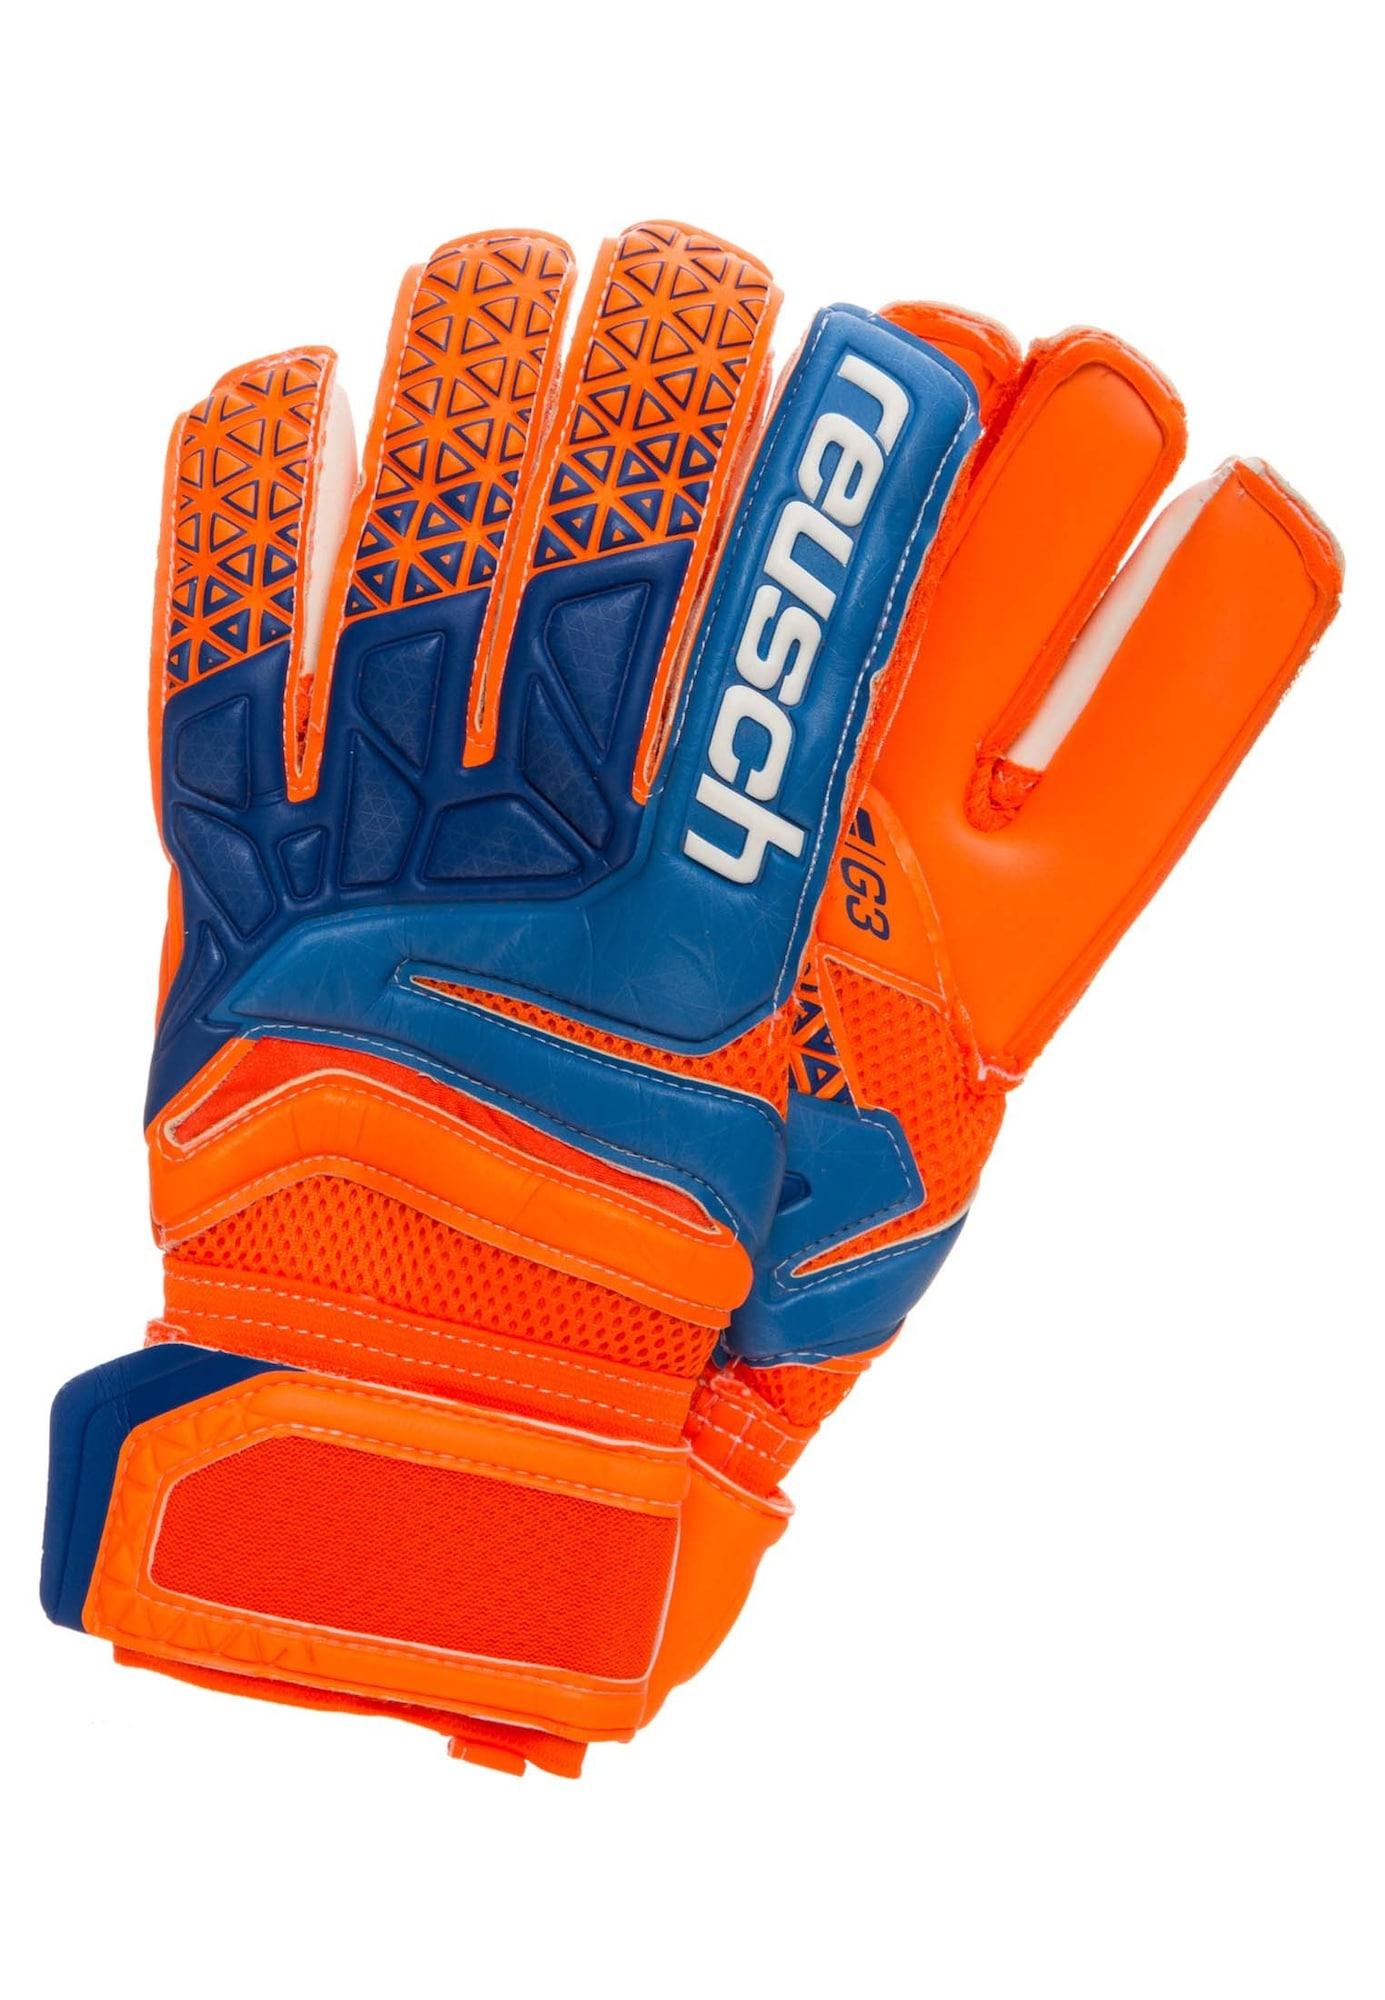 Torwarthandschuh 'Prisma Prime G3' | Accessoires > Handschuhe | Blau | REUSCH